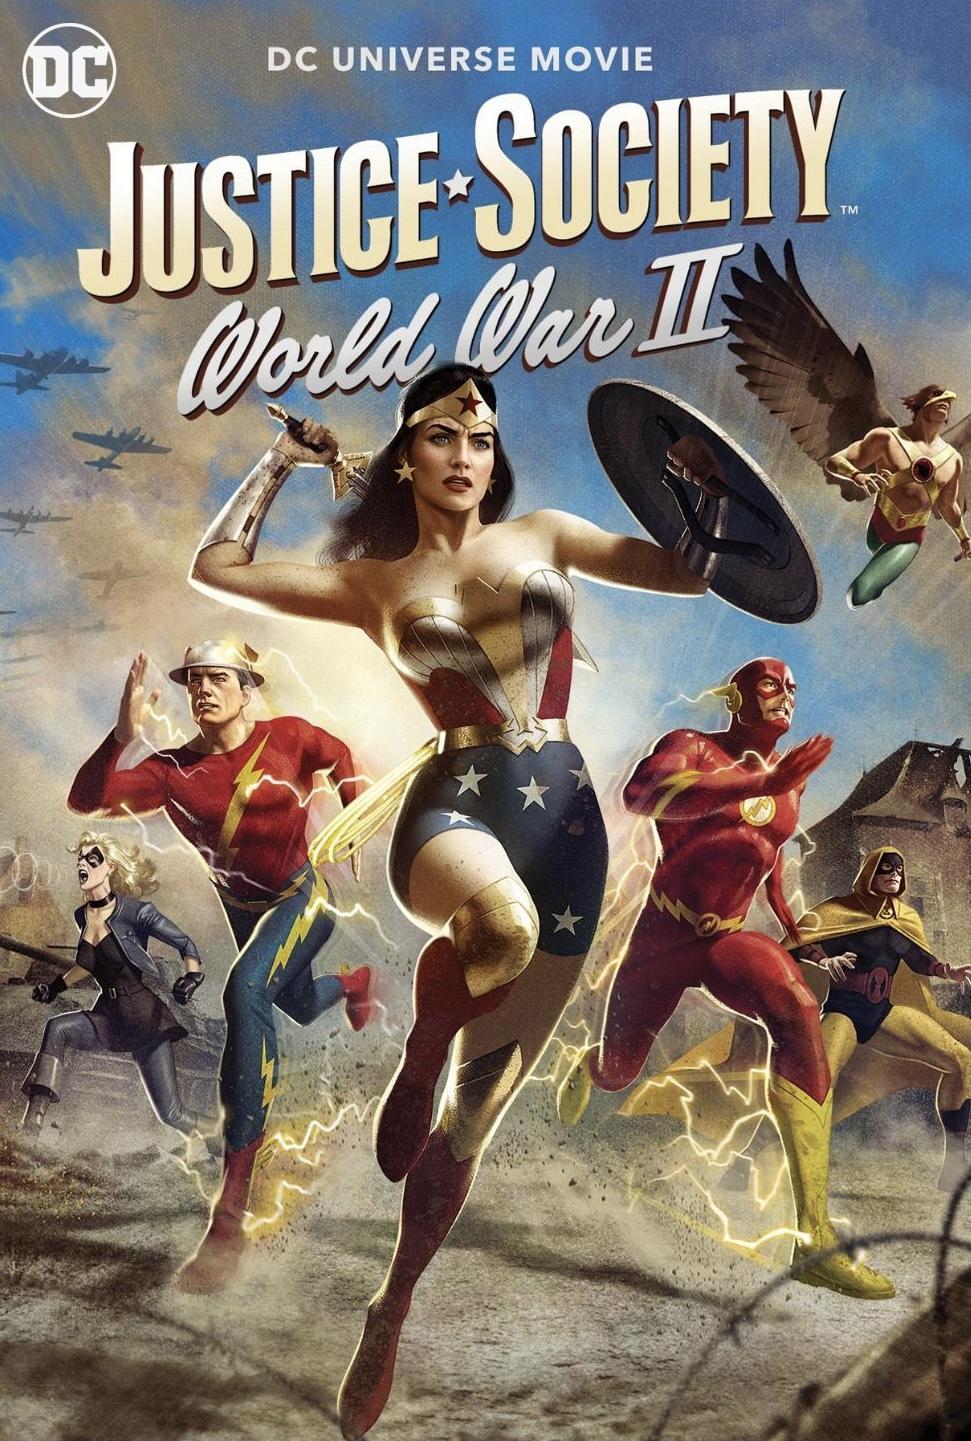 Justice Society World War II (2021) English 720p WEB-DL x264 AAC 750MB Download